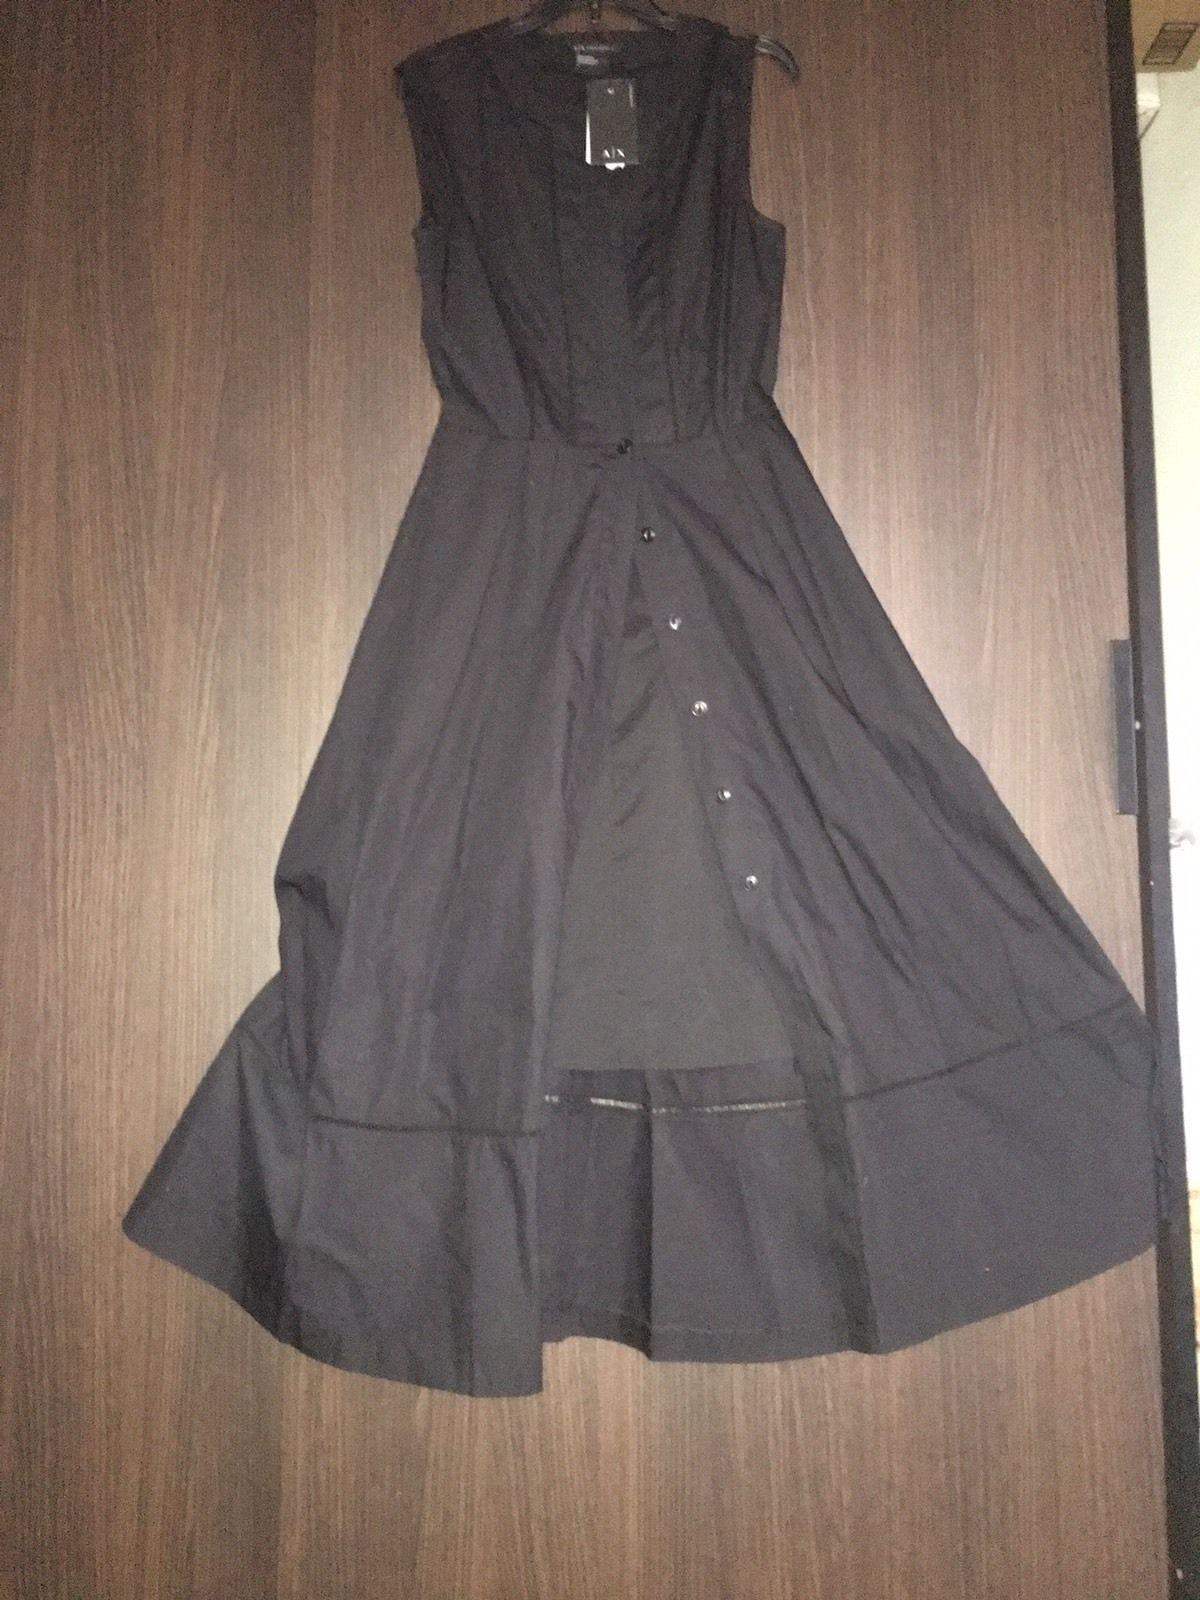 Nice New Dress Woman Armani Exchange 2017, Black Color, Size 4, midi Dress,  2017-2018 Check more at http://fashion-look.top/product/new-dress-woman-armani-exchange-2017-black-color-size-4-midi-dress-2017-2018/